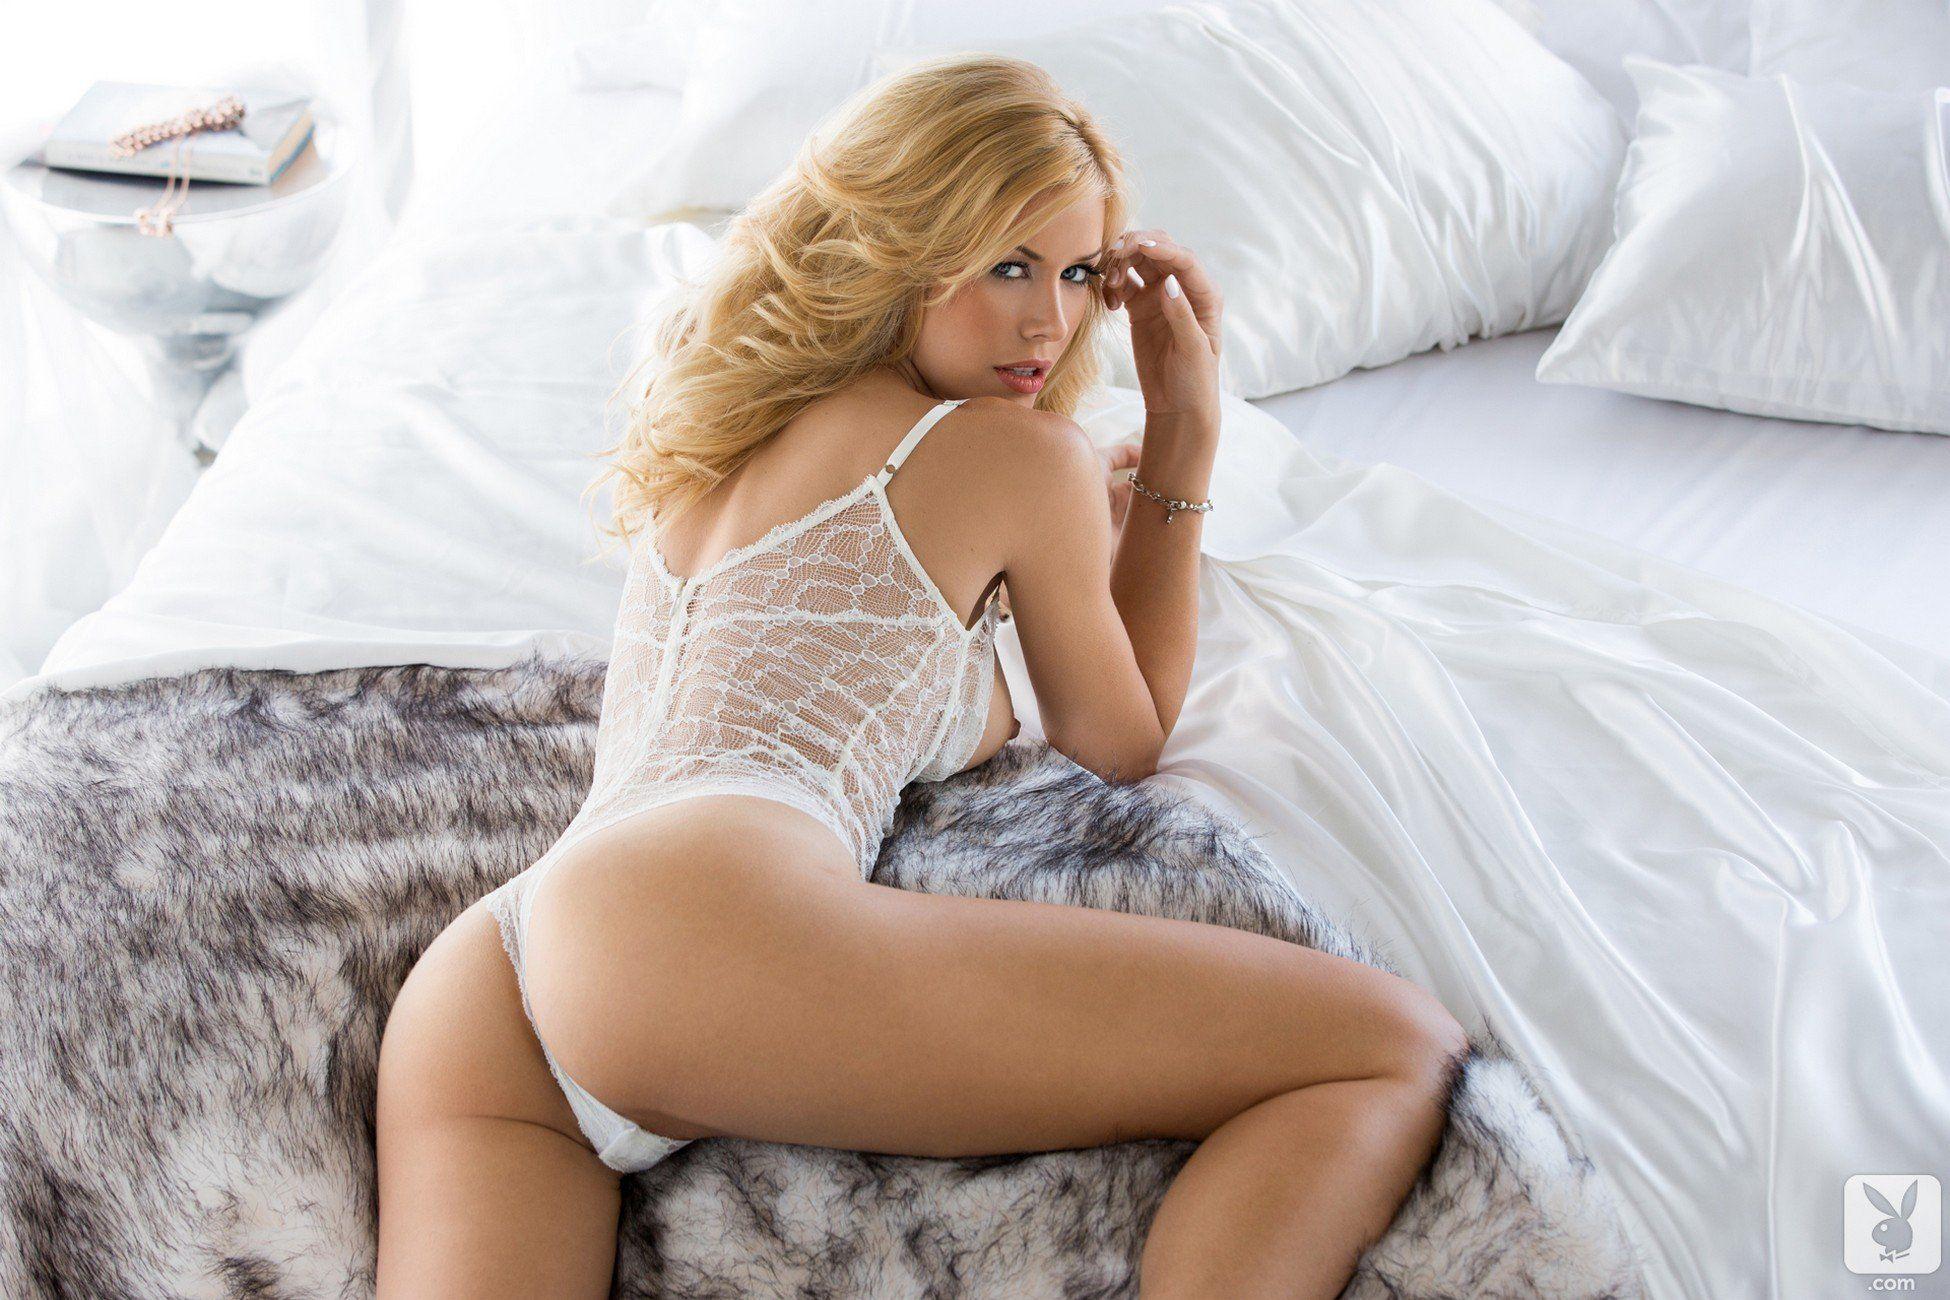 nudes (27 photo), Boobs Celebrites photos